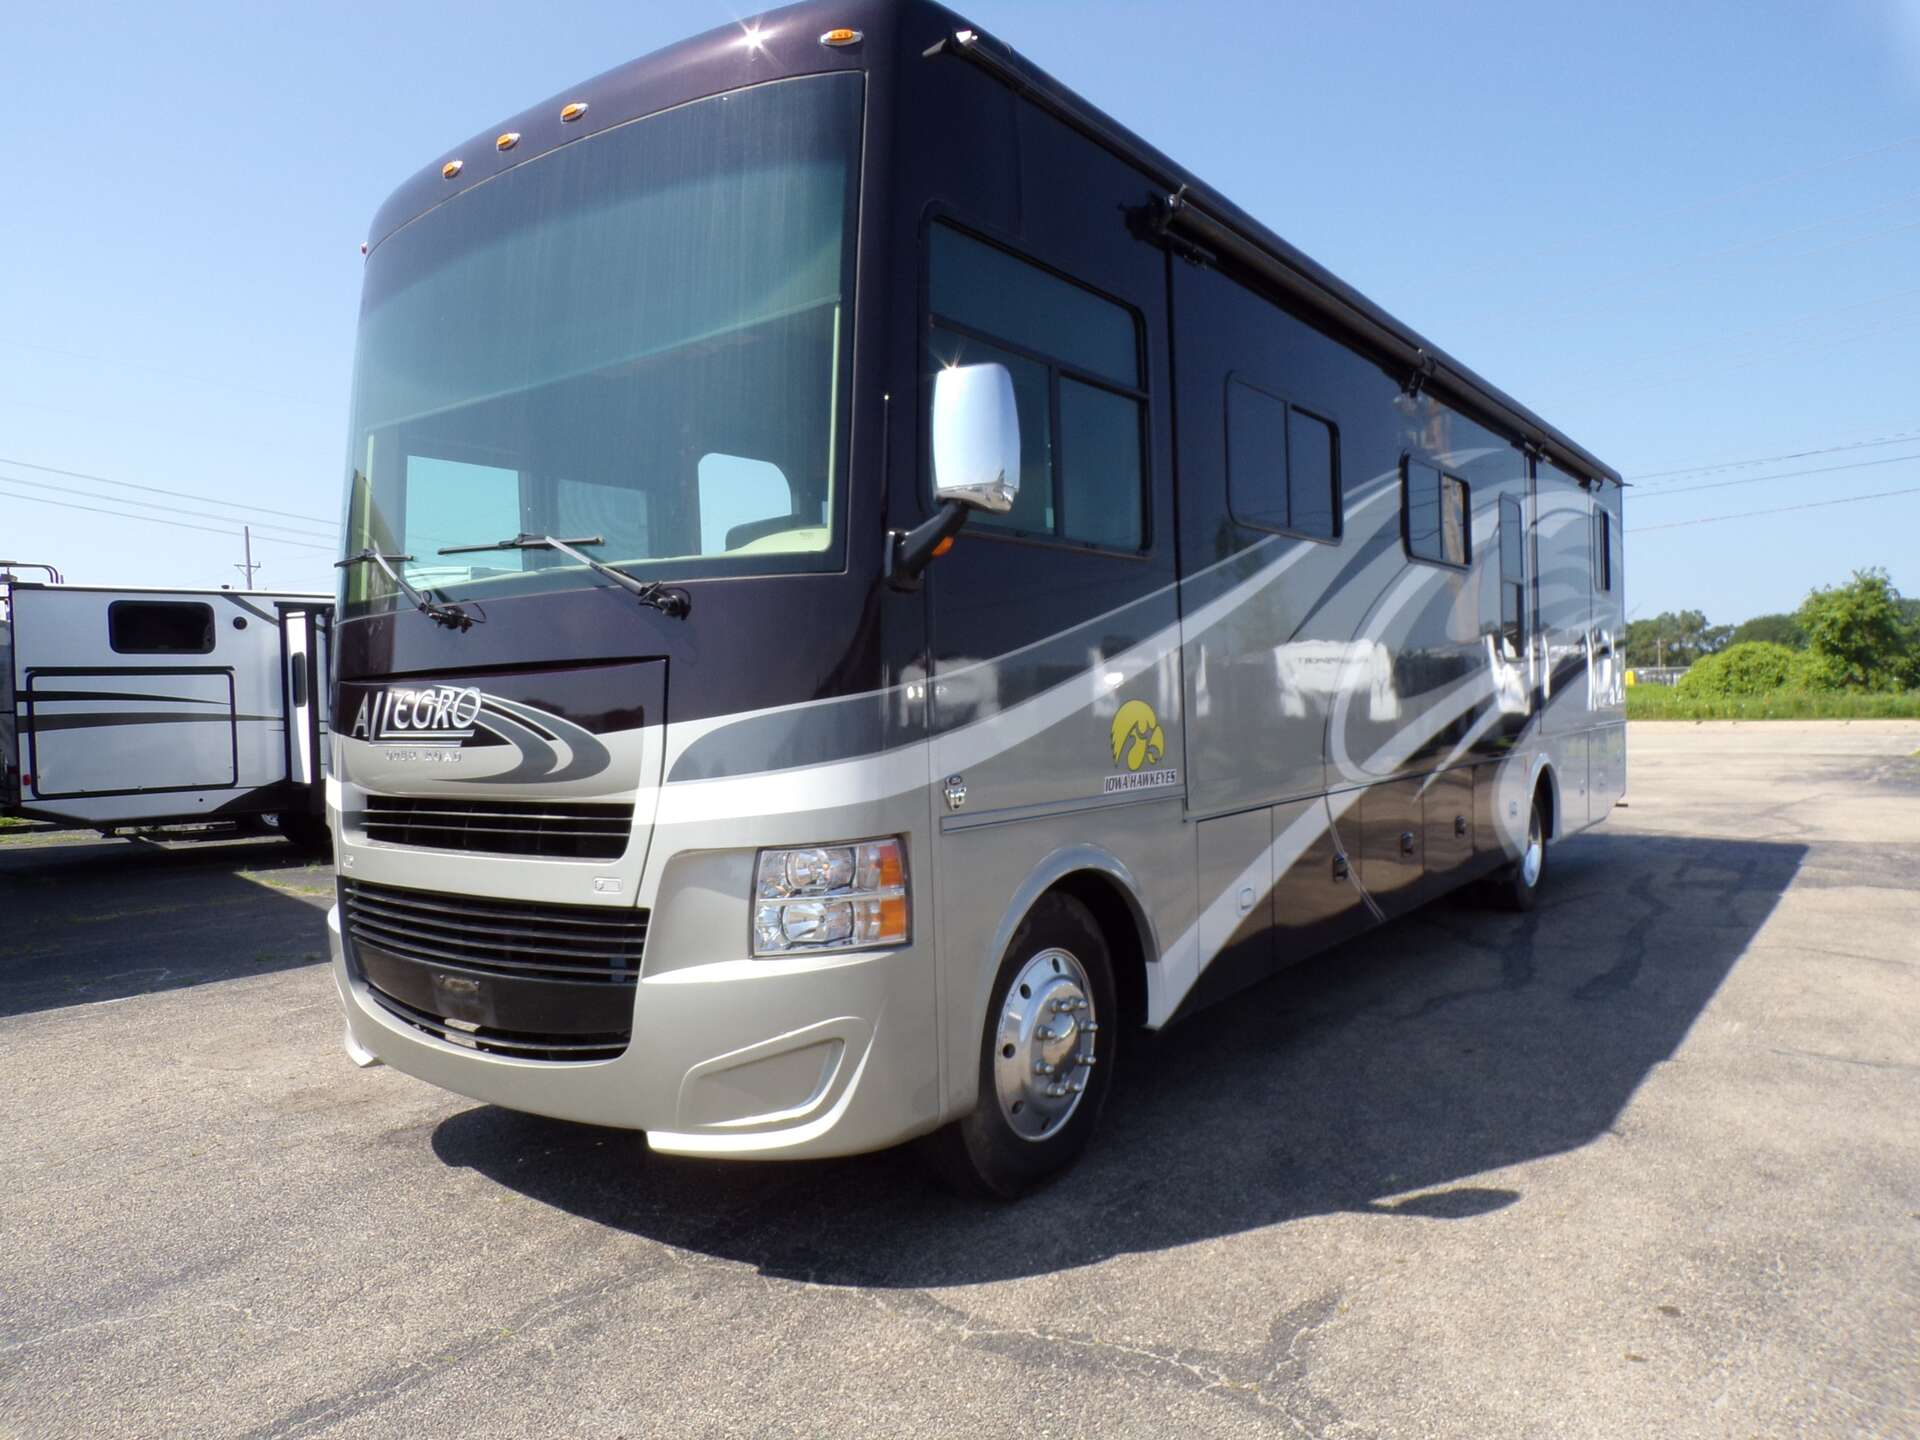 Used 2016 Tiffin Motorhomes Allegro 36 LA in Rock Falls, IL